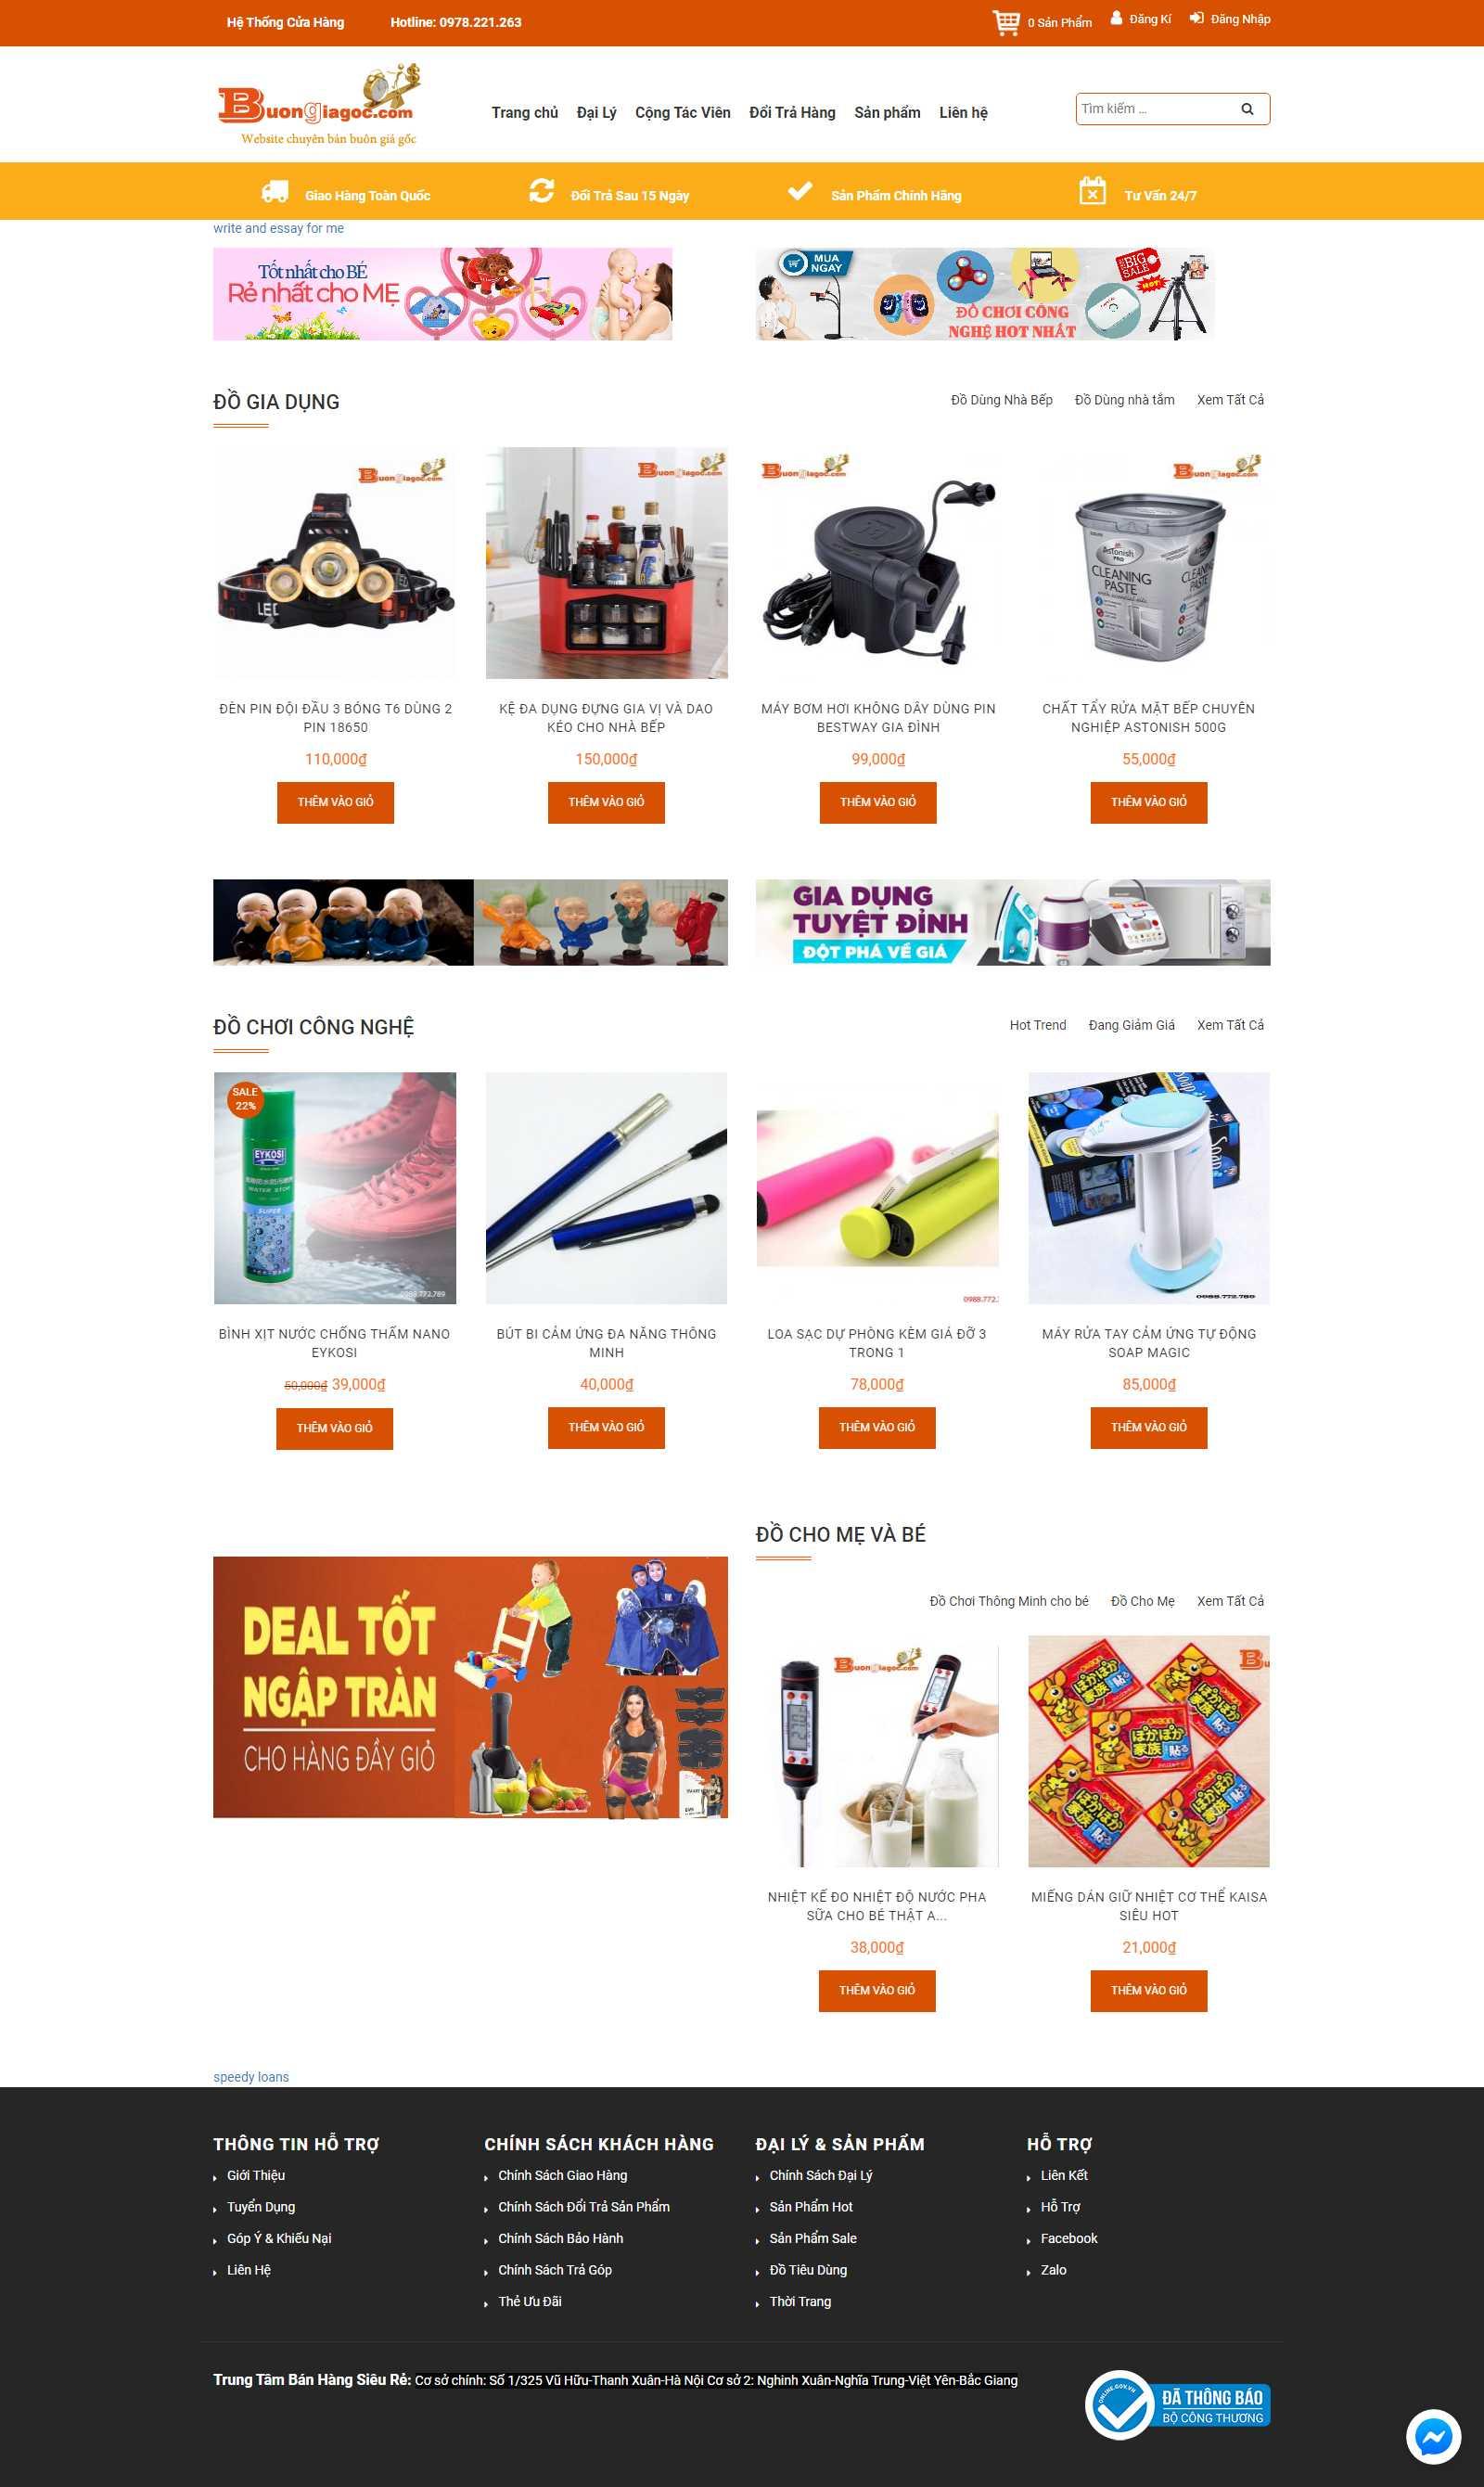 Thiết kế Web bán buôn - buongiagoc.com